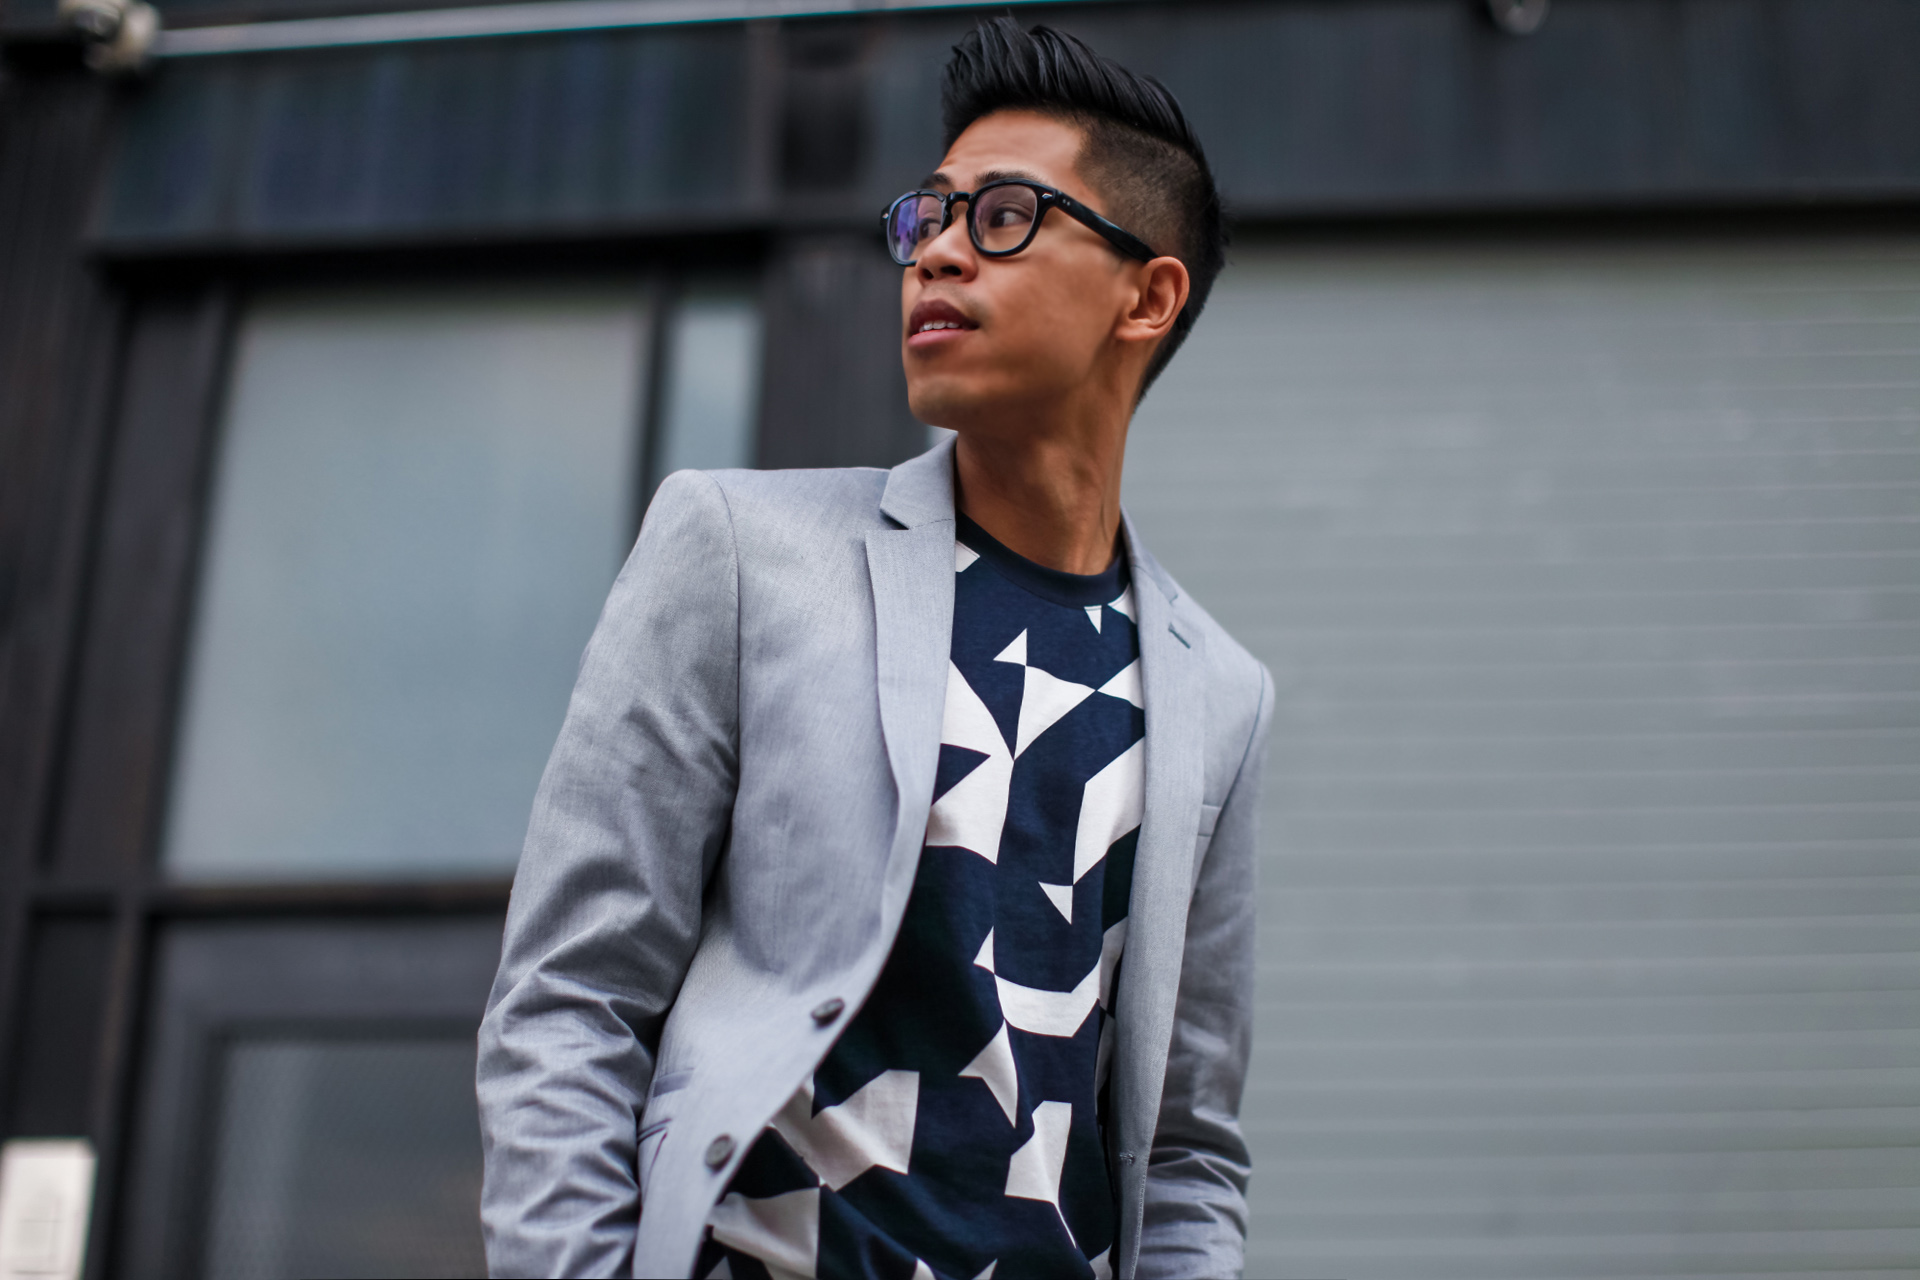 oh anthonio - Anthony Urbano - men's Express suit